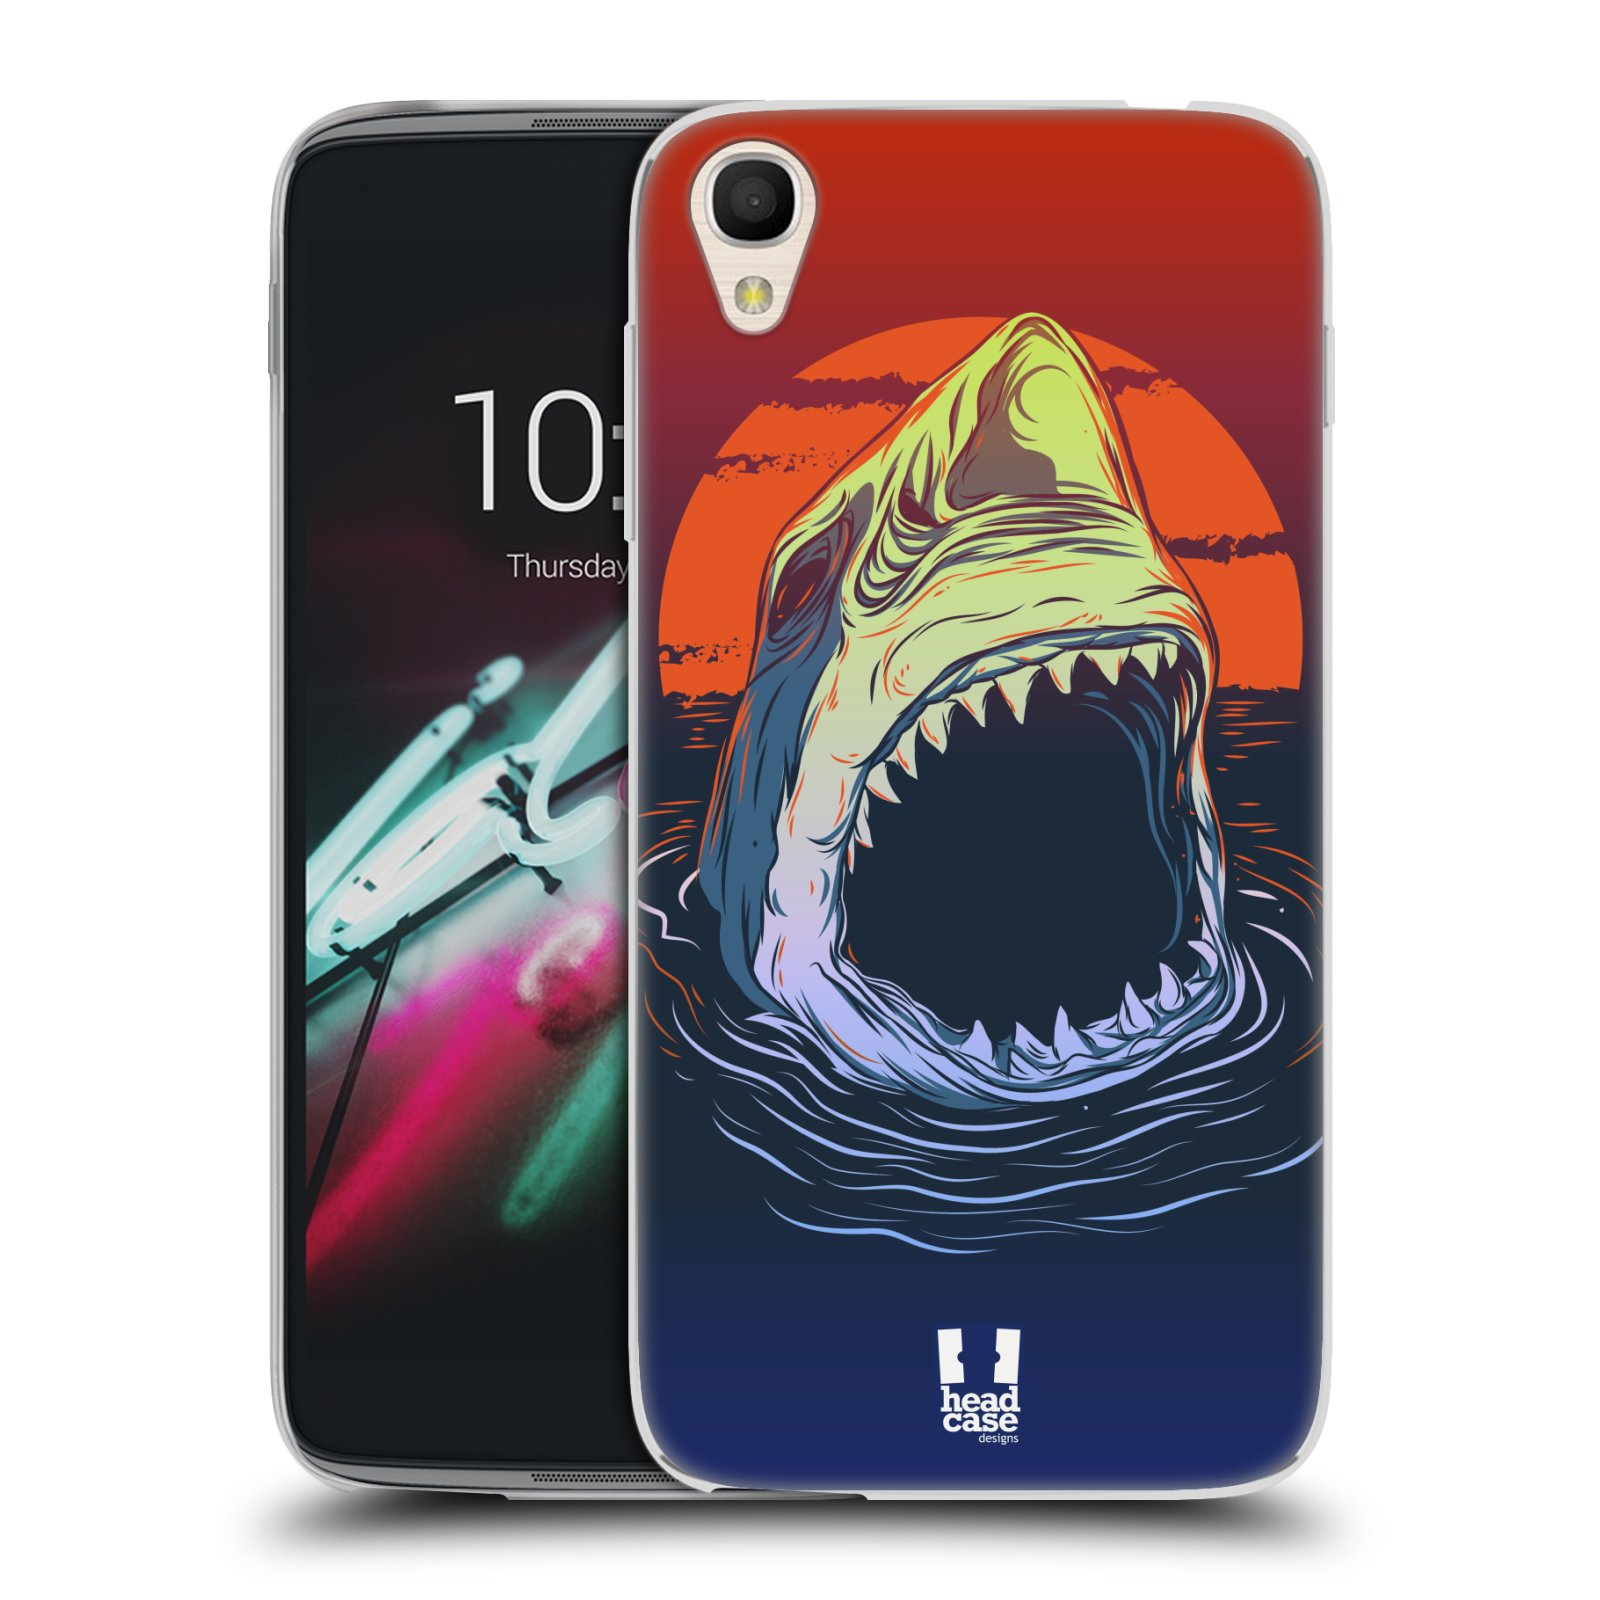 "Silikonové pouzdro na mobil Alcatel One Touch 6039Y Idol 3 HEAD CASE HLADOVÝ ŽRALOK (Silikonový kryt či obal na mobilní telefon Alcatel One Touch Idol 3 OT-6039Y s 4,7"" displejem)"